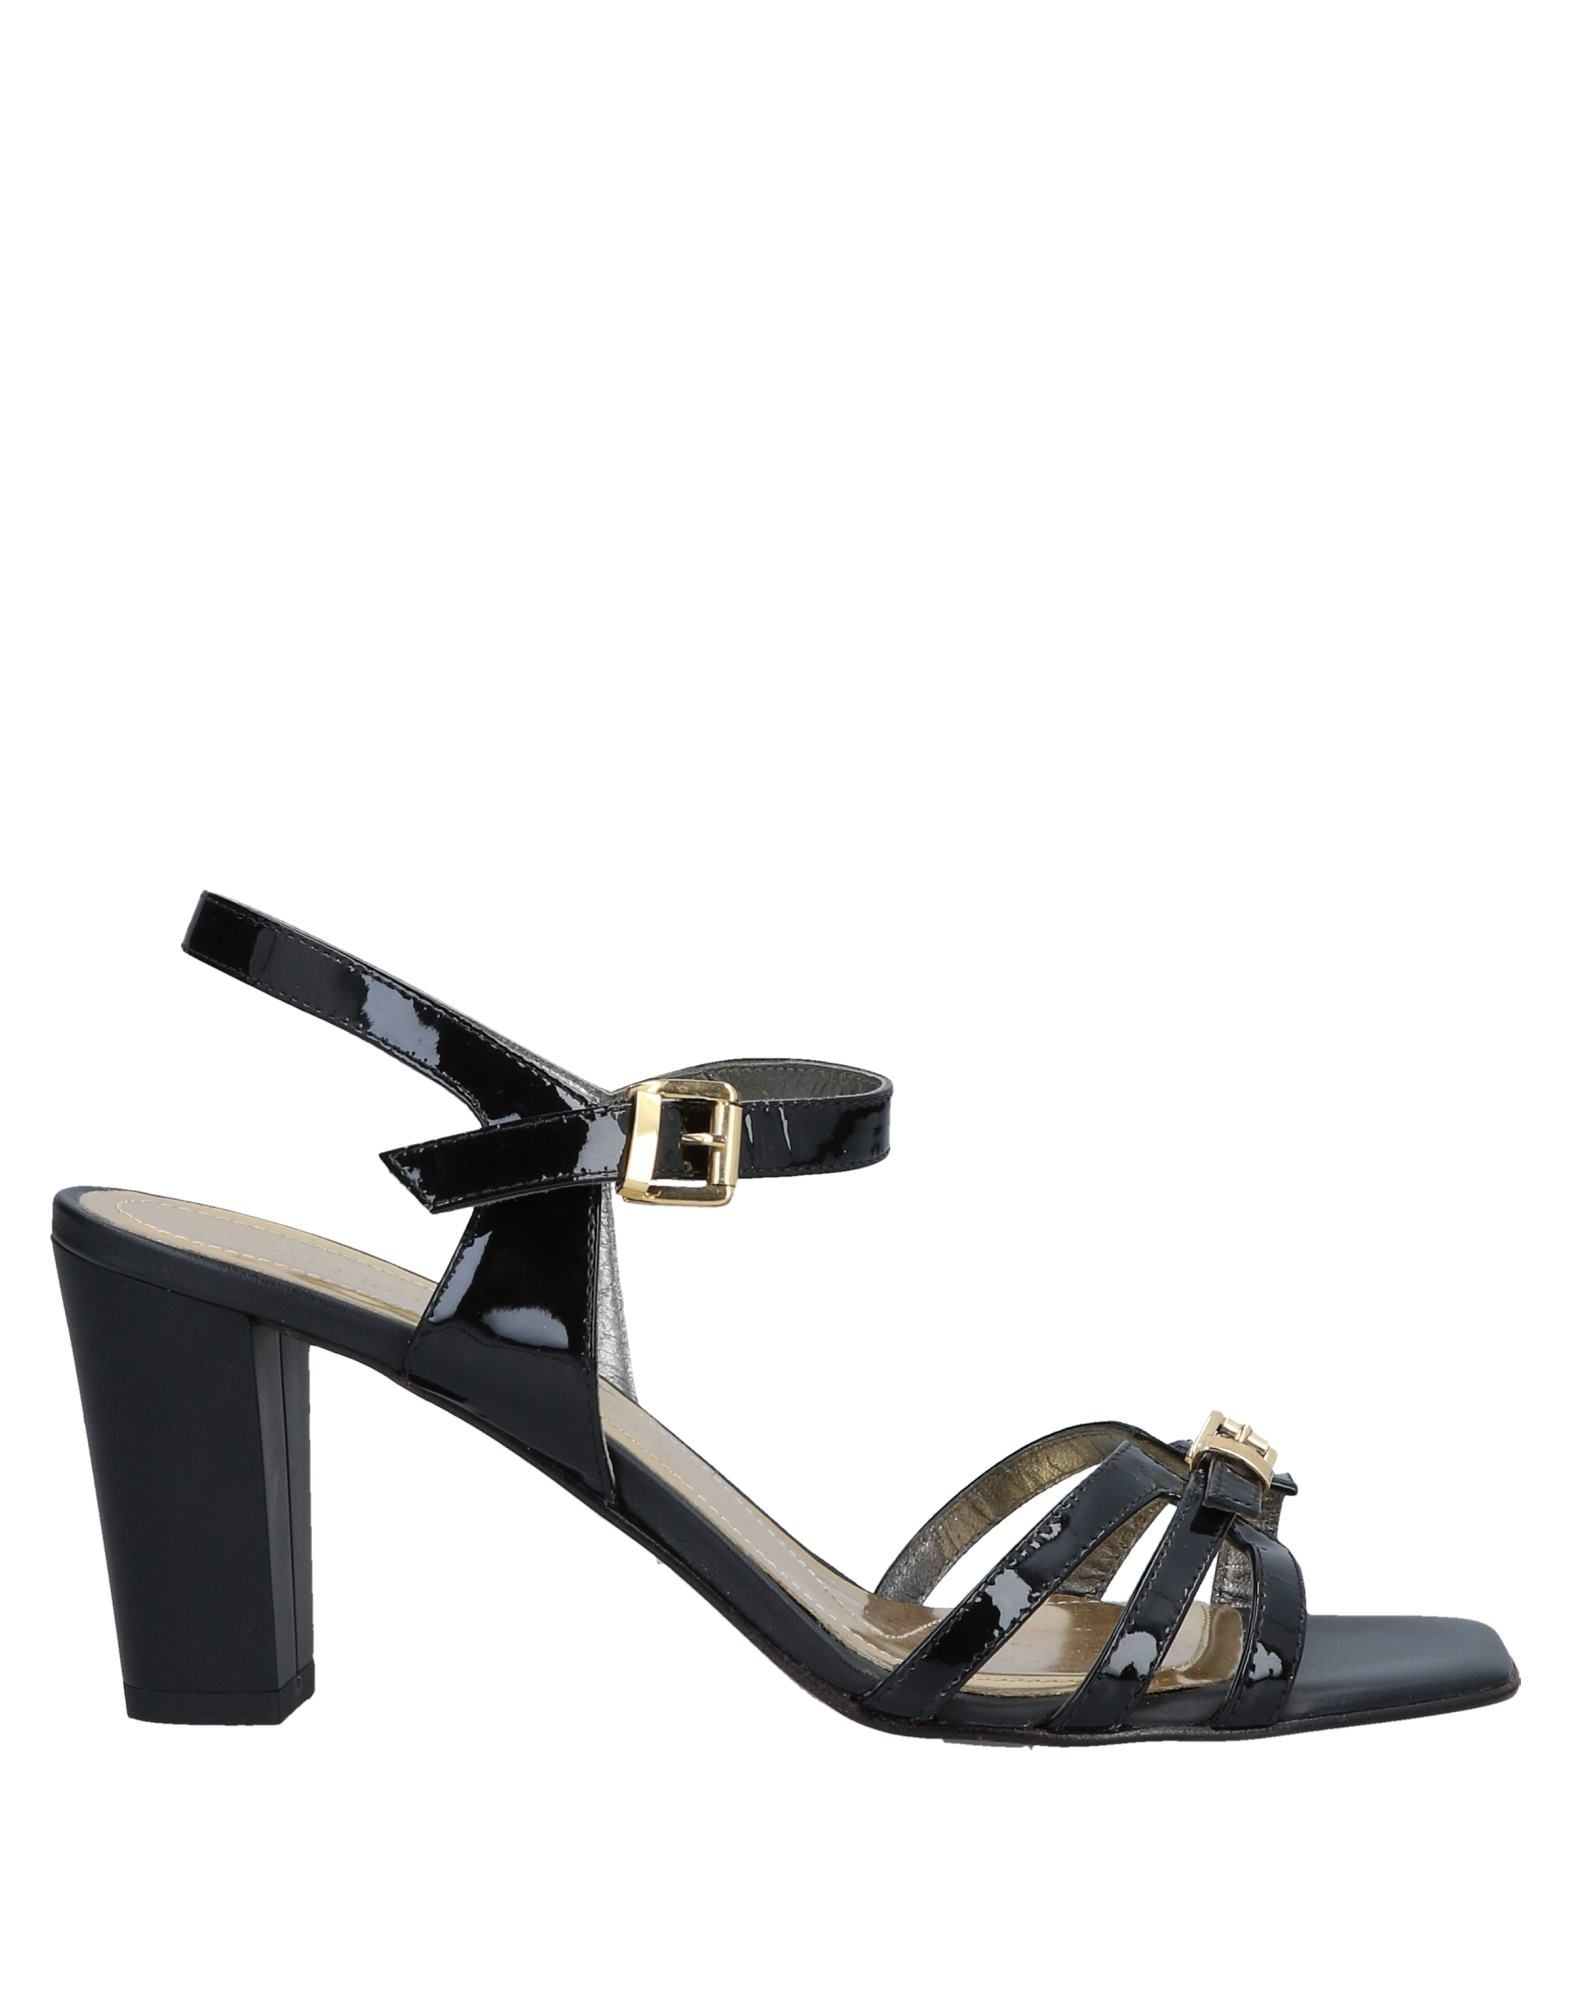 Loretta Pettinari Sandals - Women Loretta Pettinari on Sandals online on Pettinari  Australia - 11565317WH 1c790d